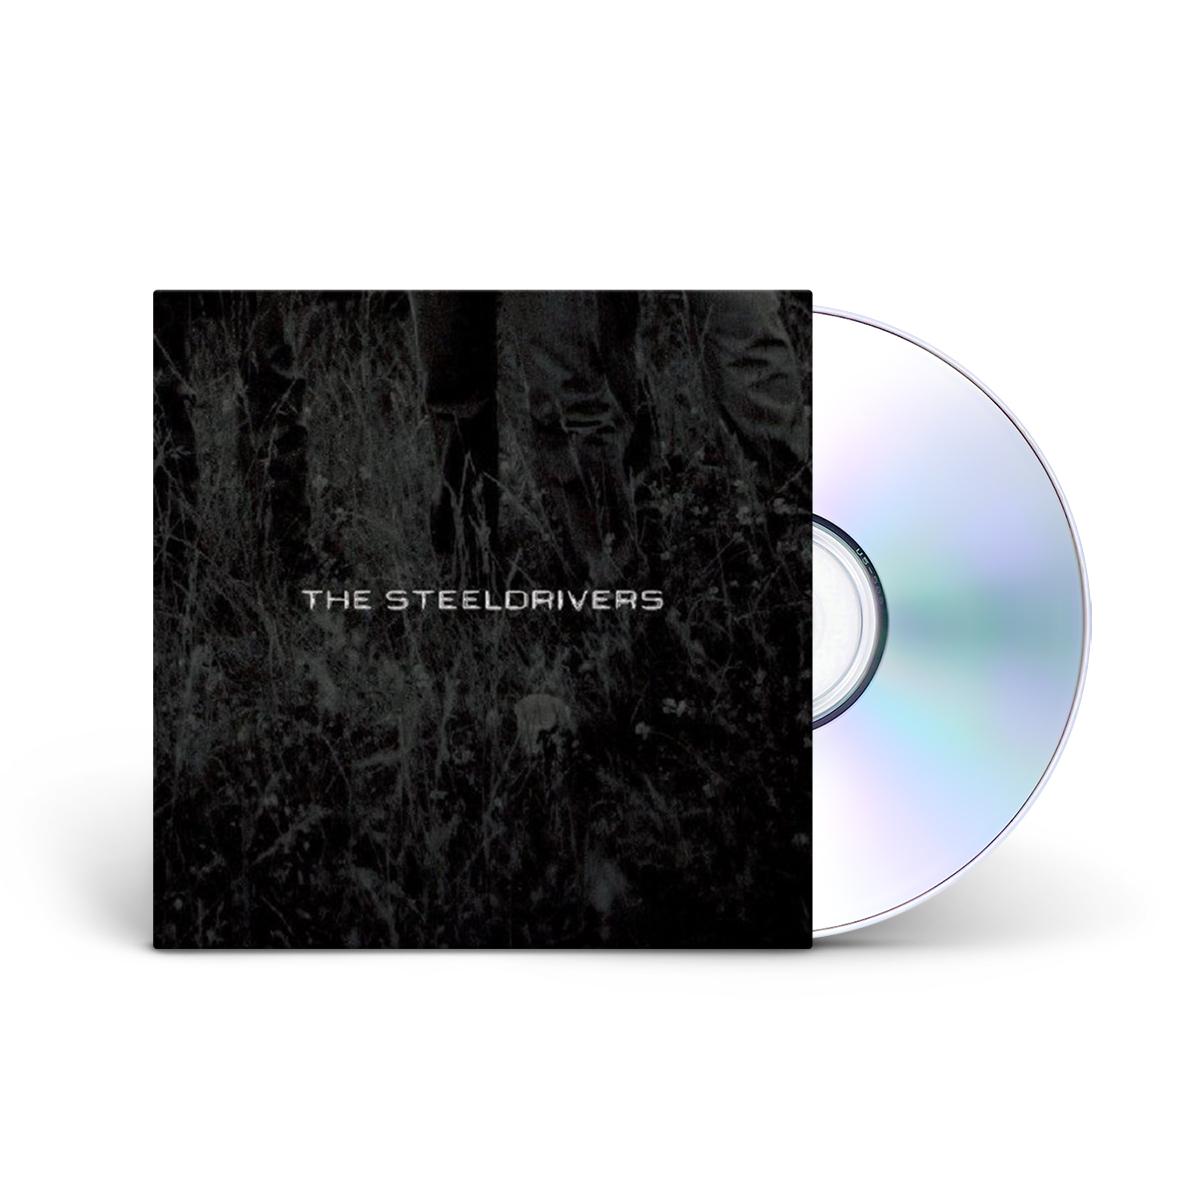 "The SteelDrivers - ""The SteelDrivers"" - CD"